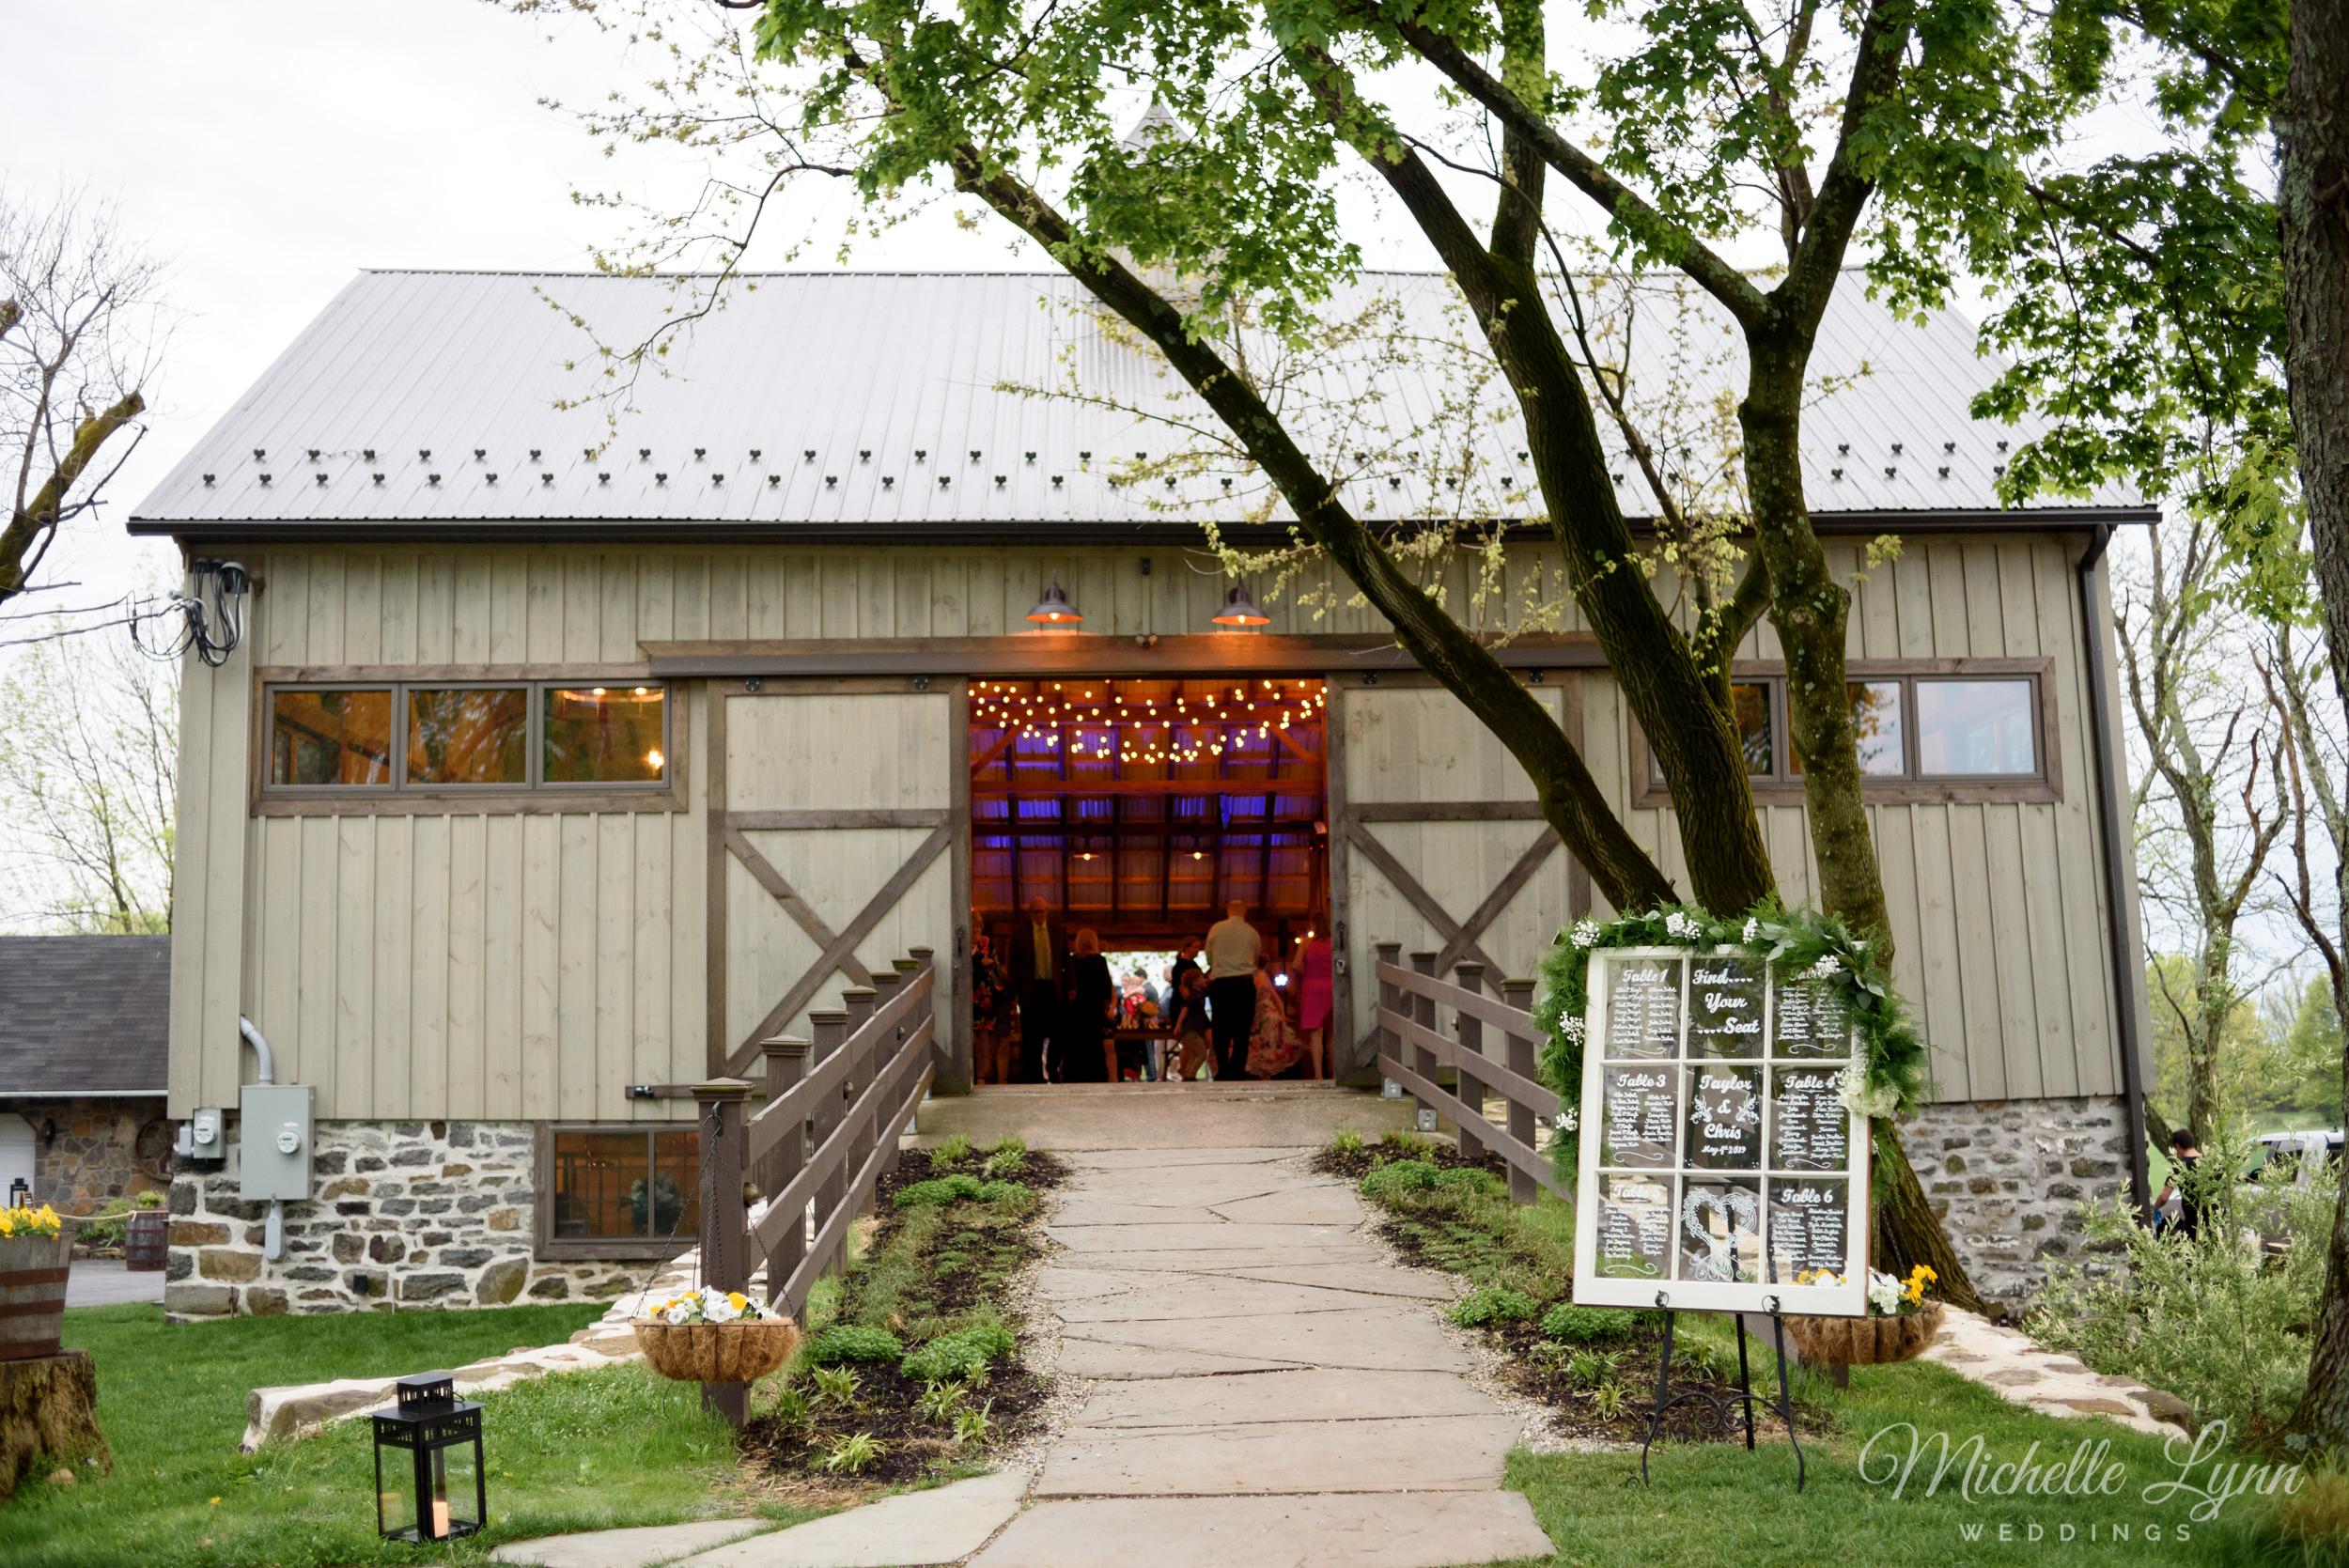 mlw-the-farm-bakery-and-events-wedding-photos-57.jpg